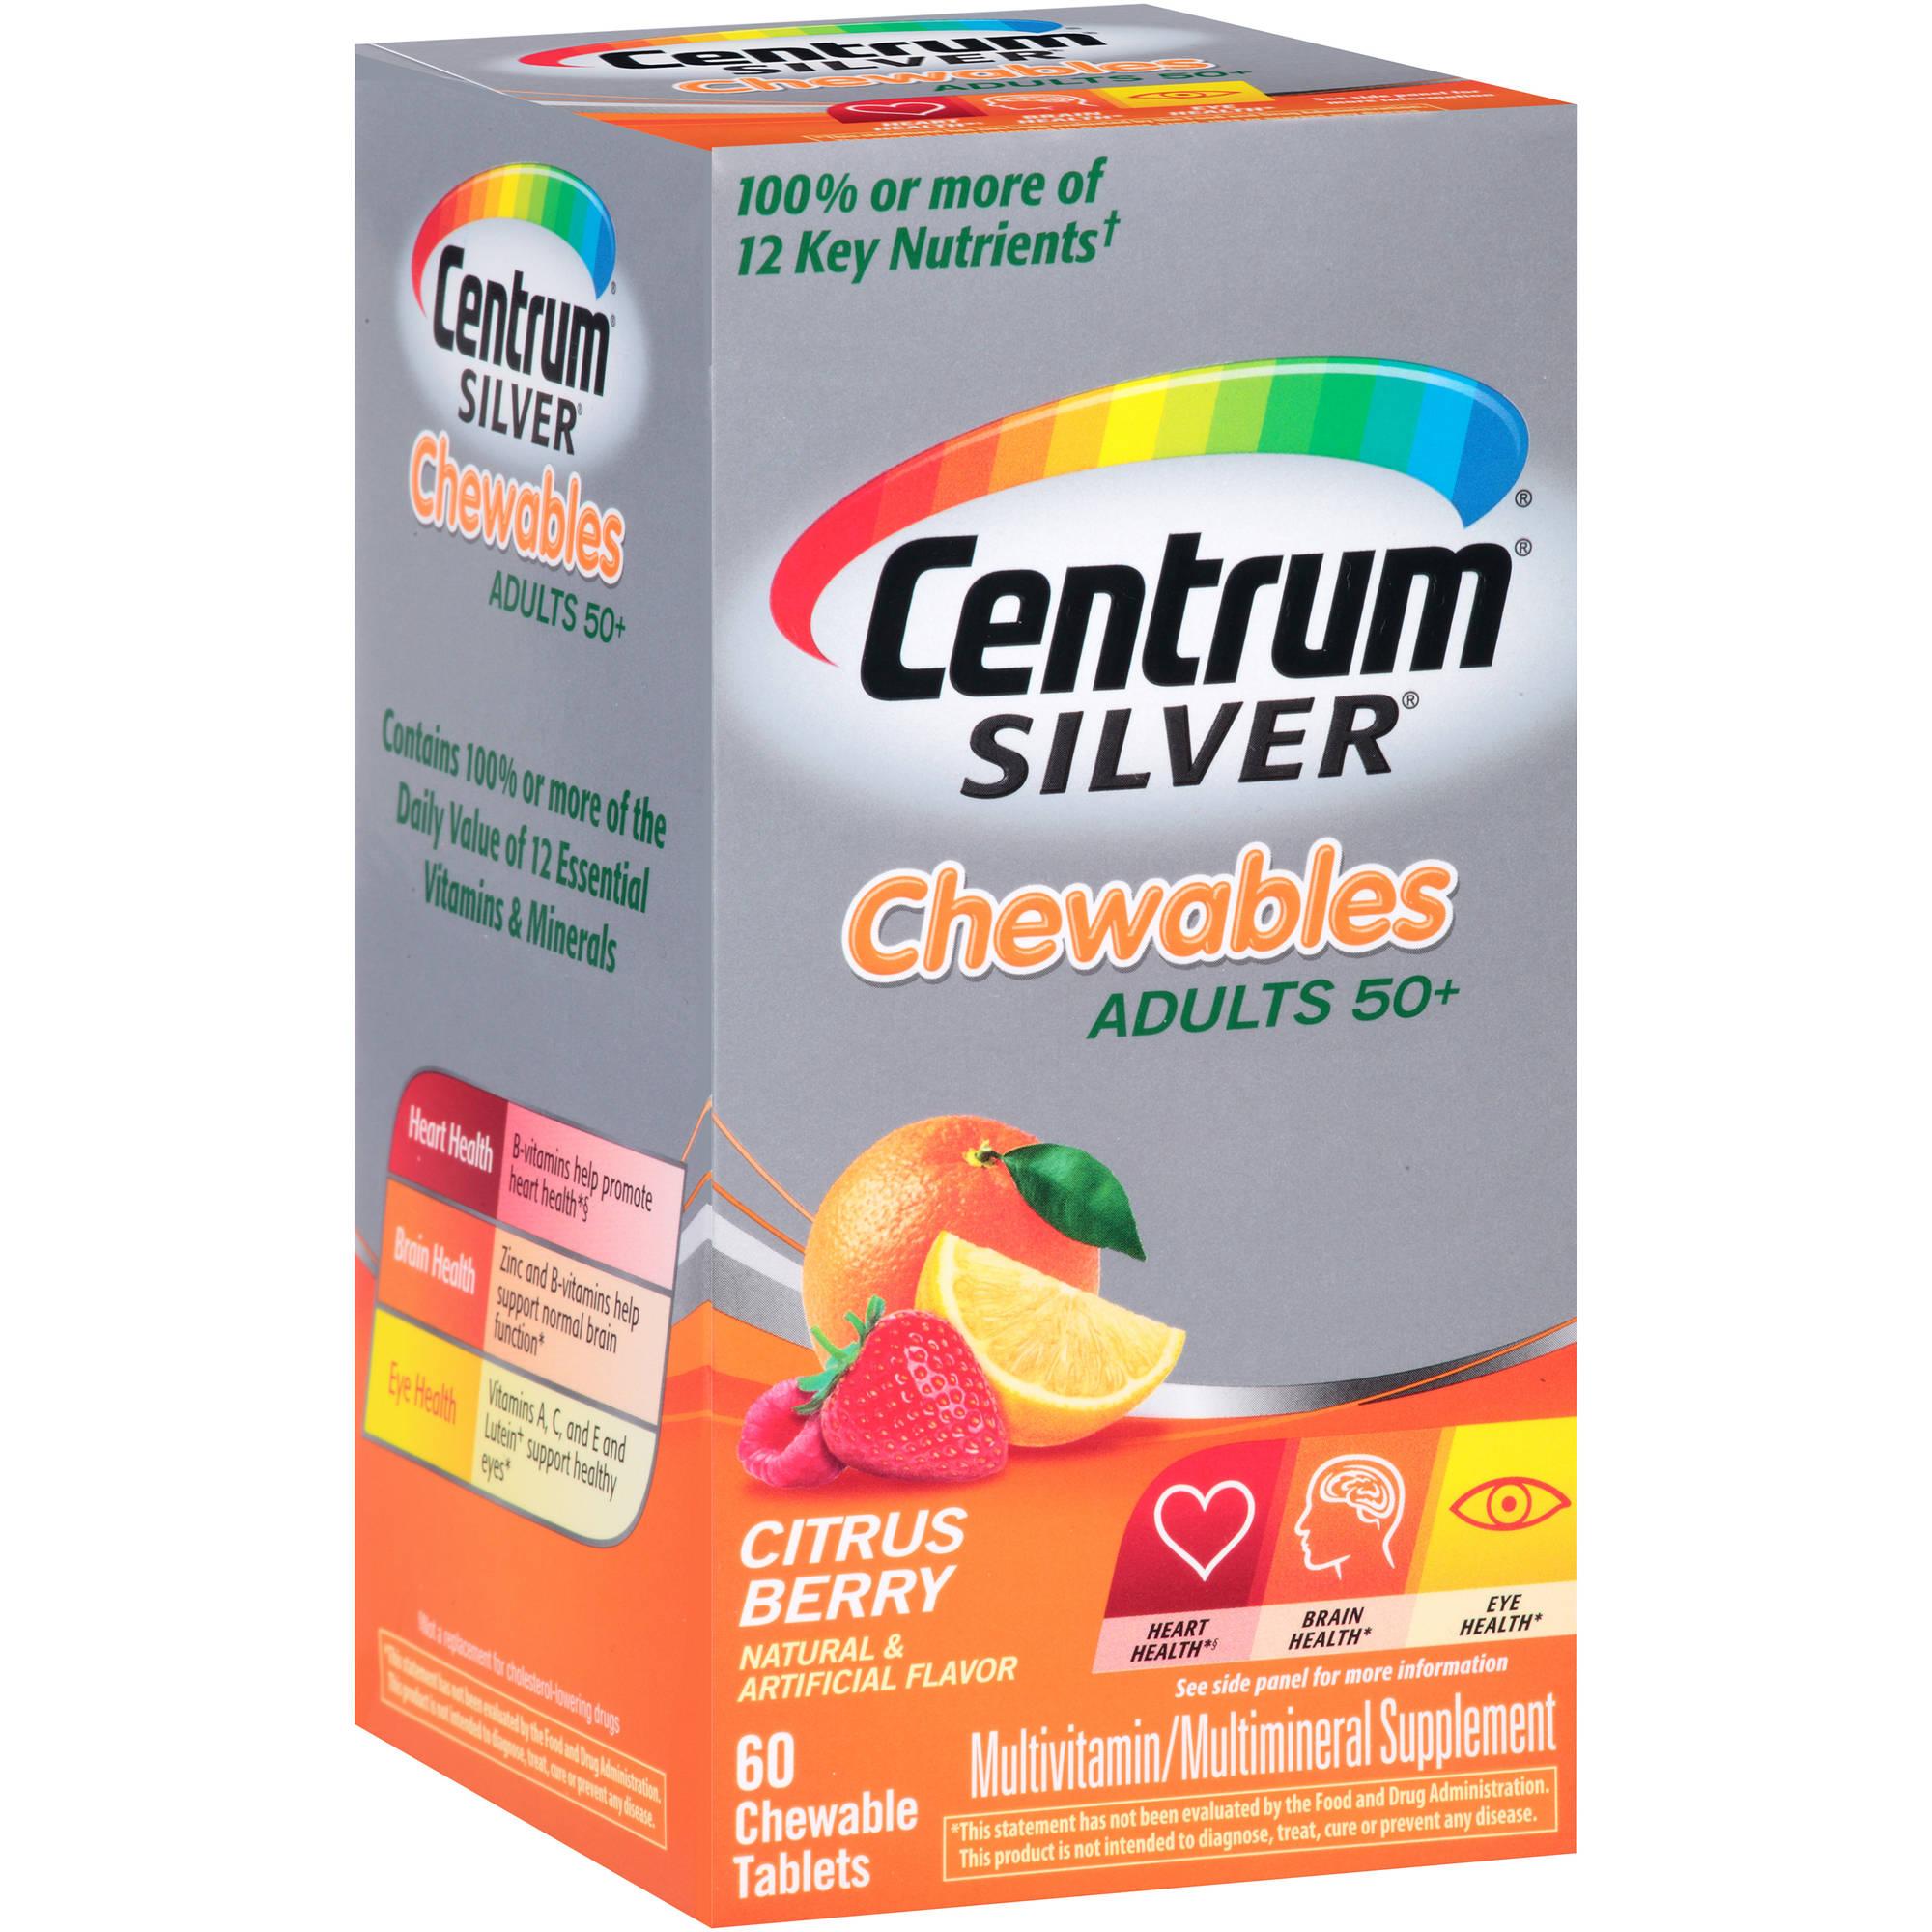 Centrum Silver Chewable Multivitamin/Multimineral Supplement in Citrus Berry Flavor 60 Count